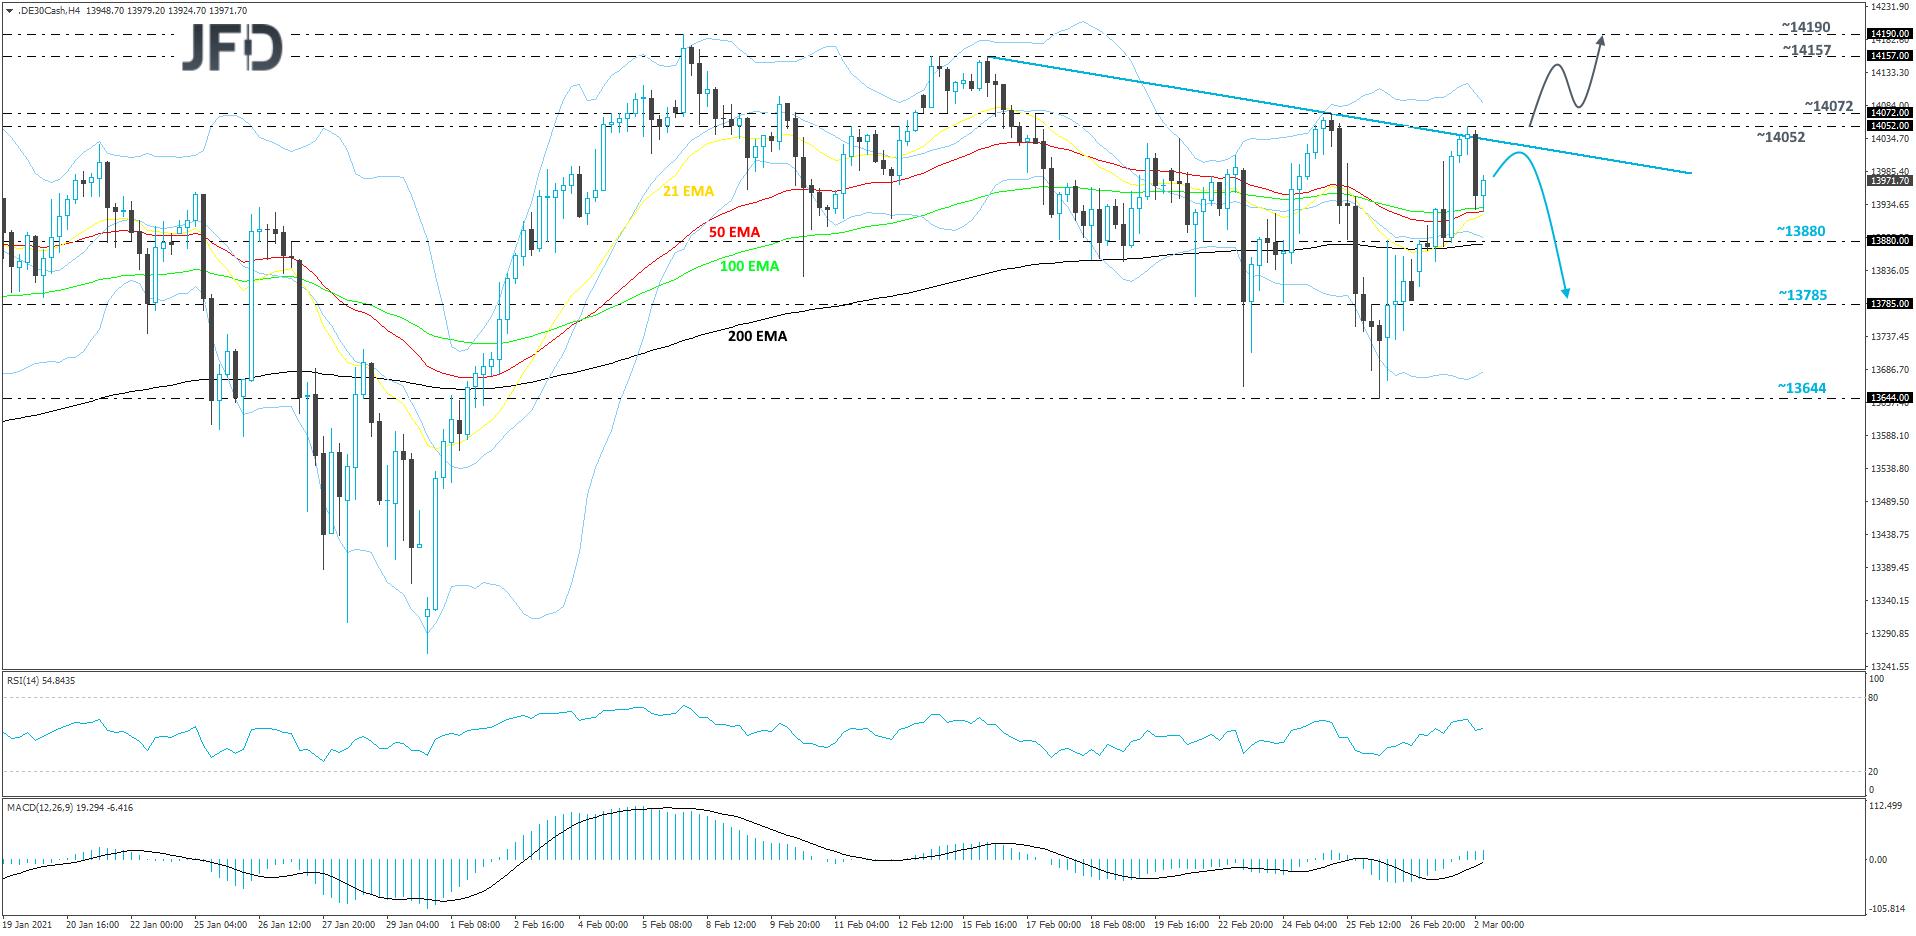 DAX cash index 4-hour chart technical analysis